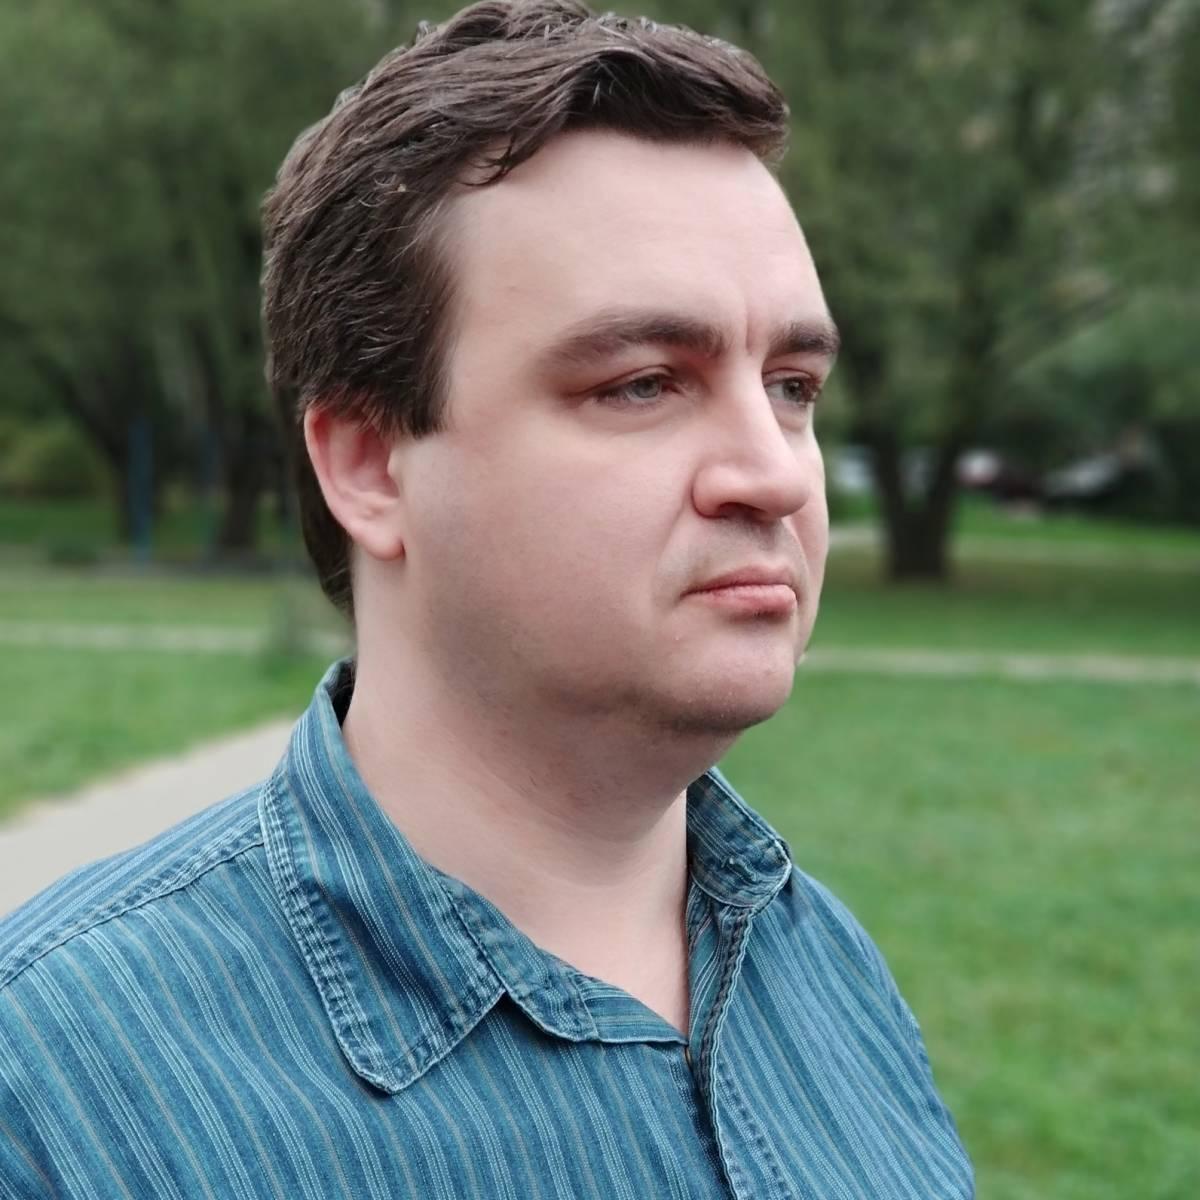 Александр Роджерс: Об очеред…